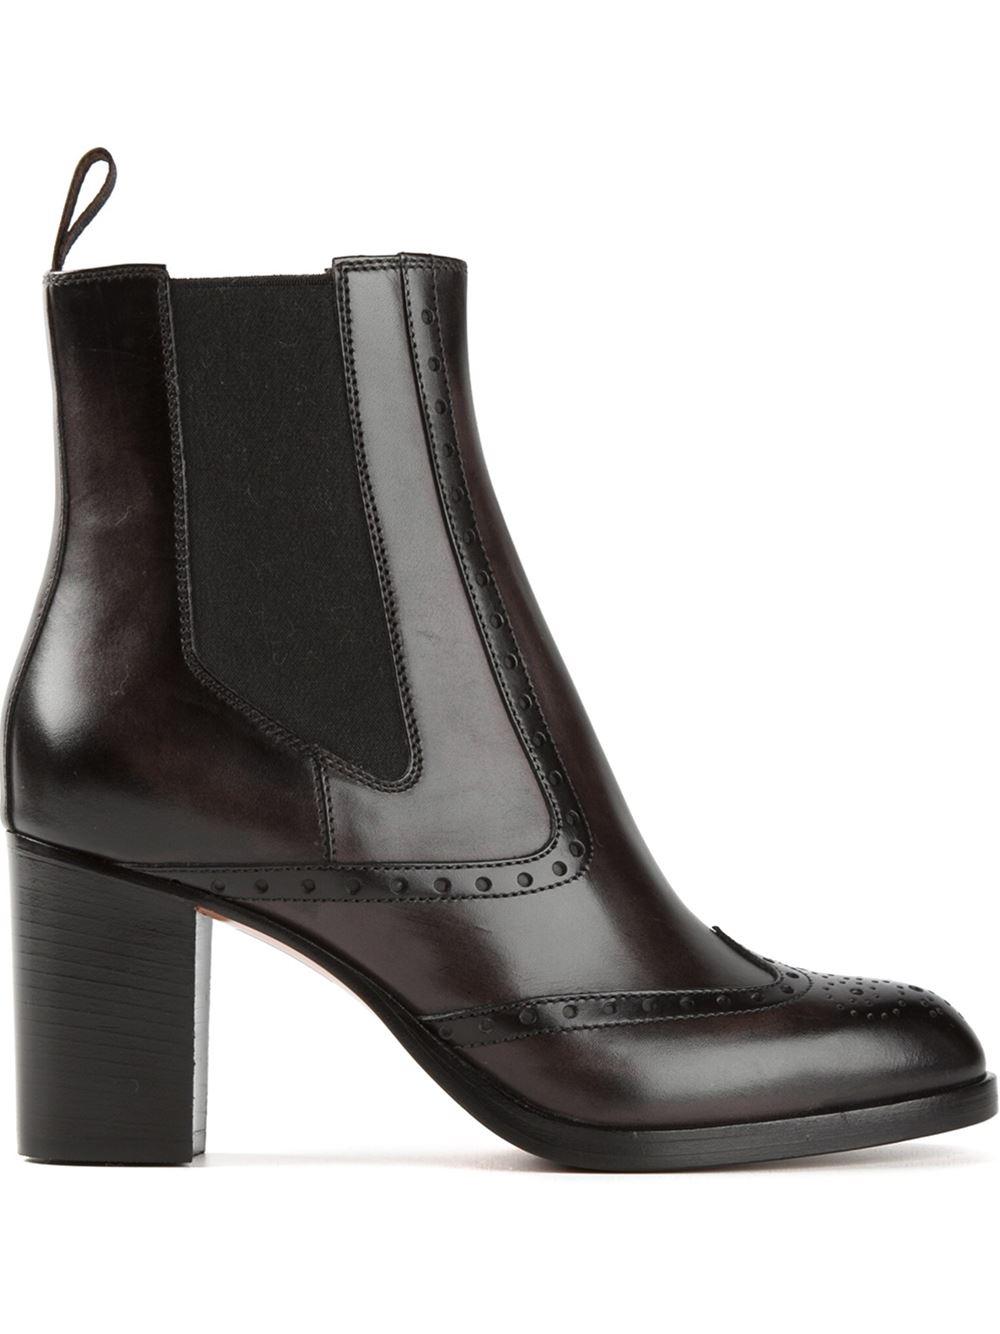 lyst santoni heeled chelsea boots in black. Black Bedroom Furniture Sets. Home Design Ideas